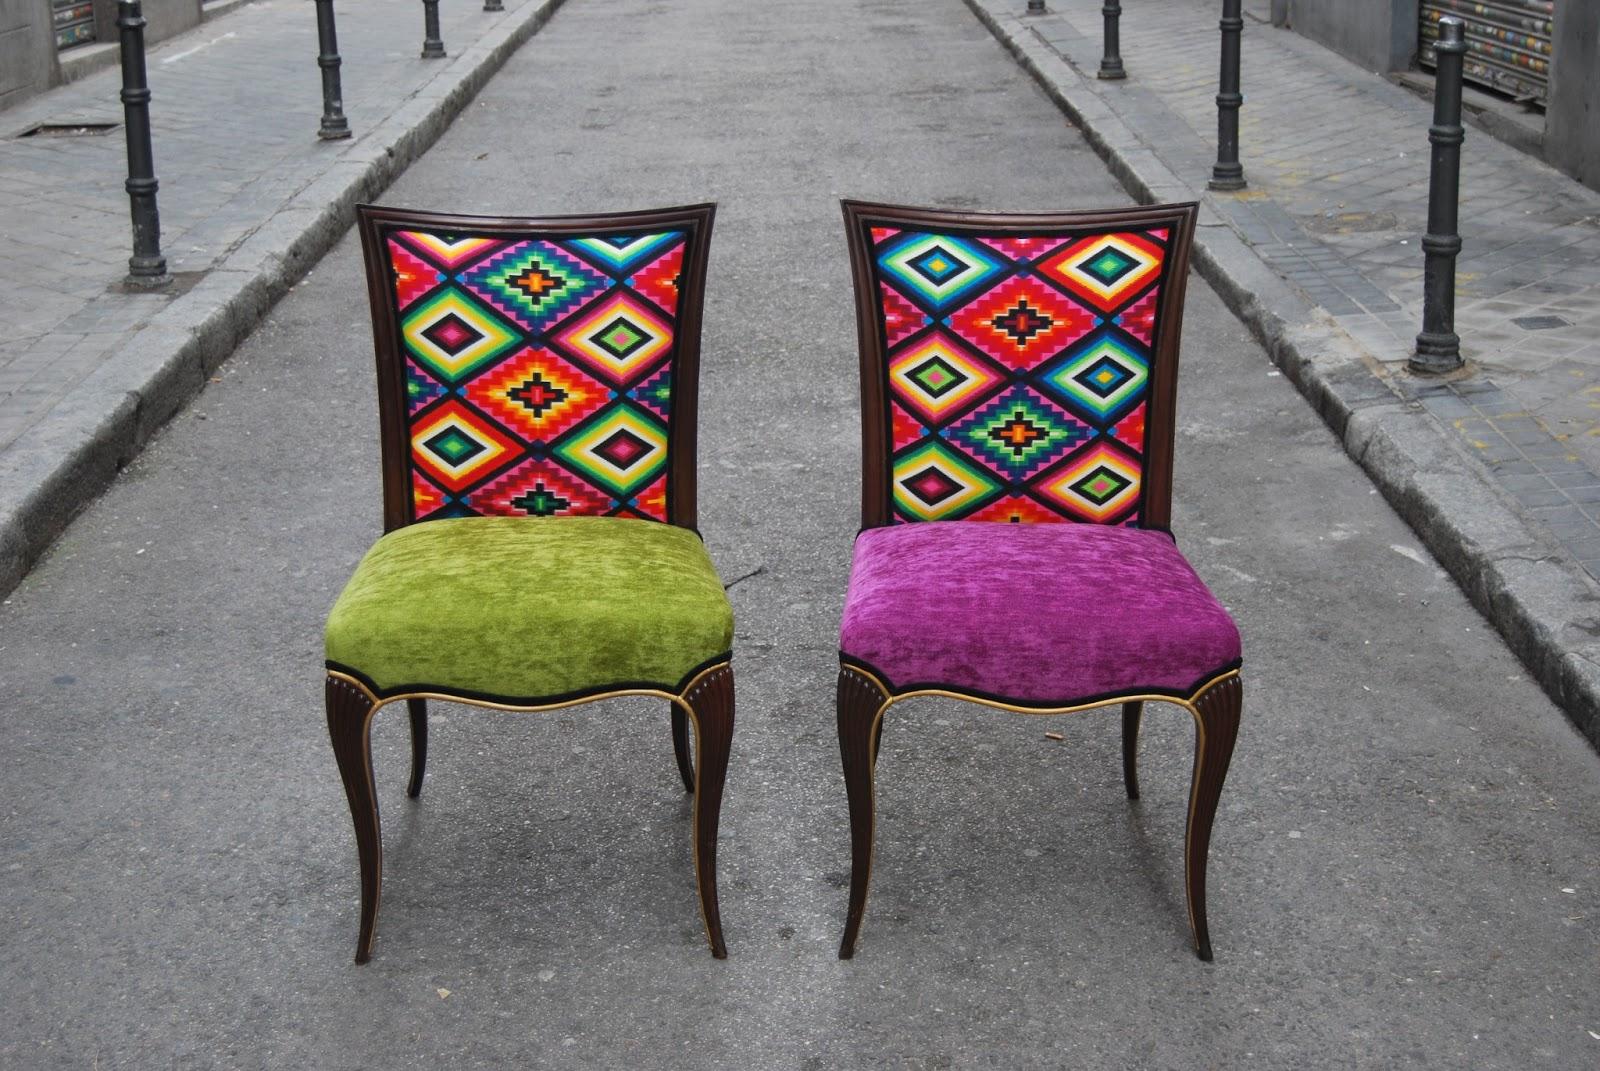 Sillas tapizadas con tela de motivos mejicanos la tapicera - Tela para tapizar sillas ...